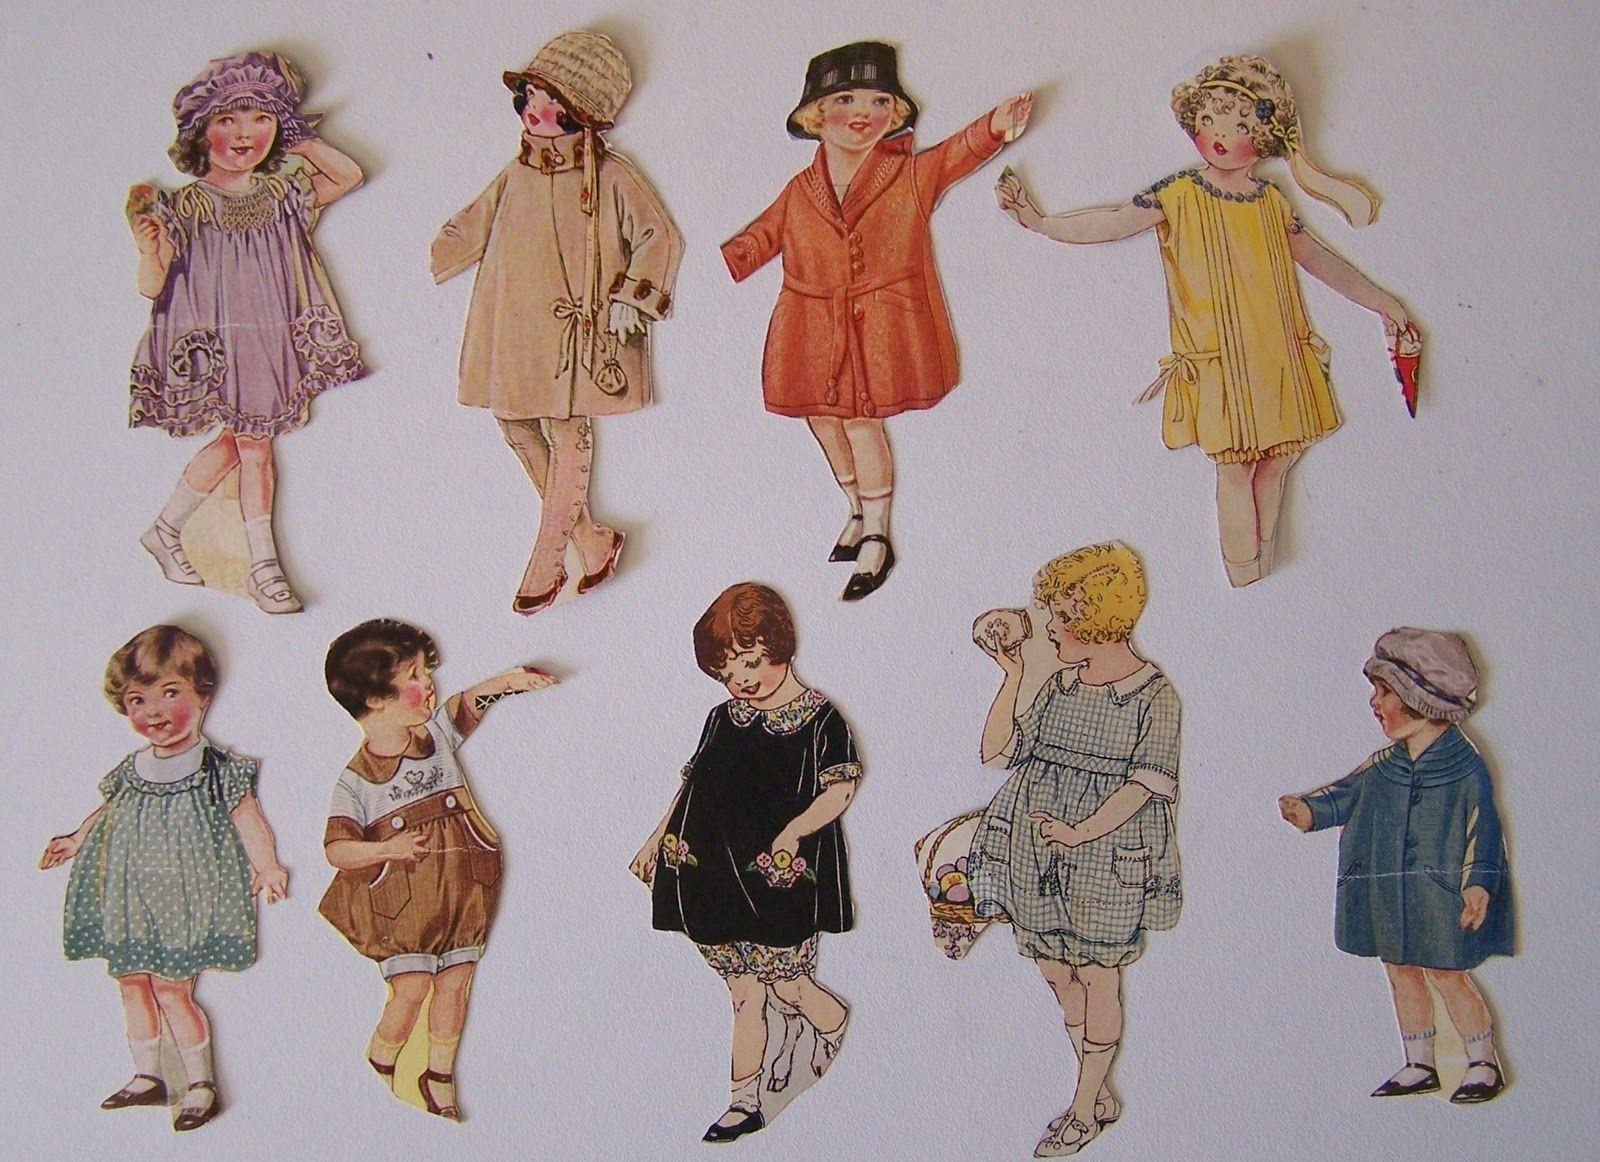 Children | 1920 | Pinterest